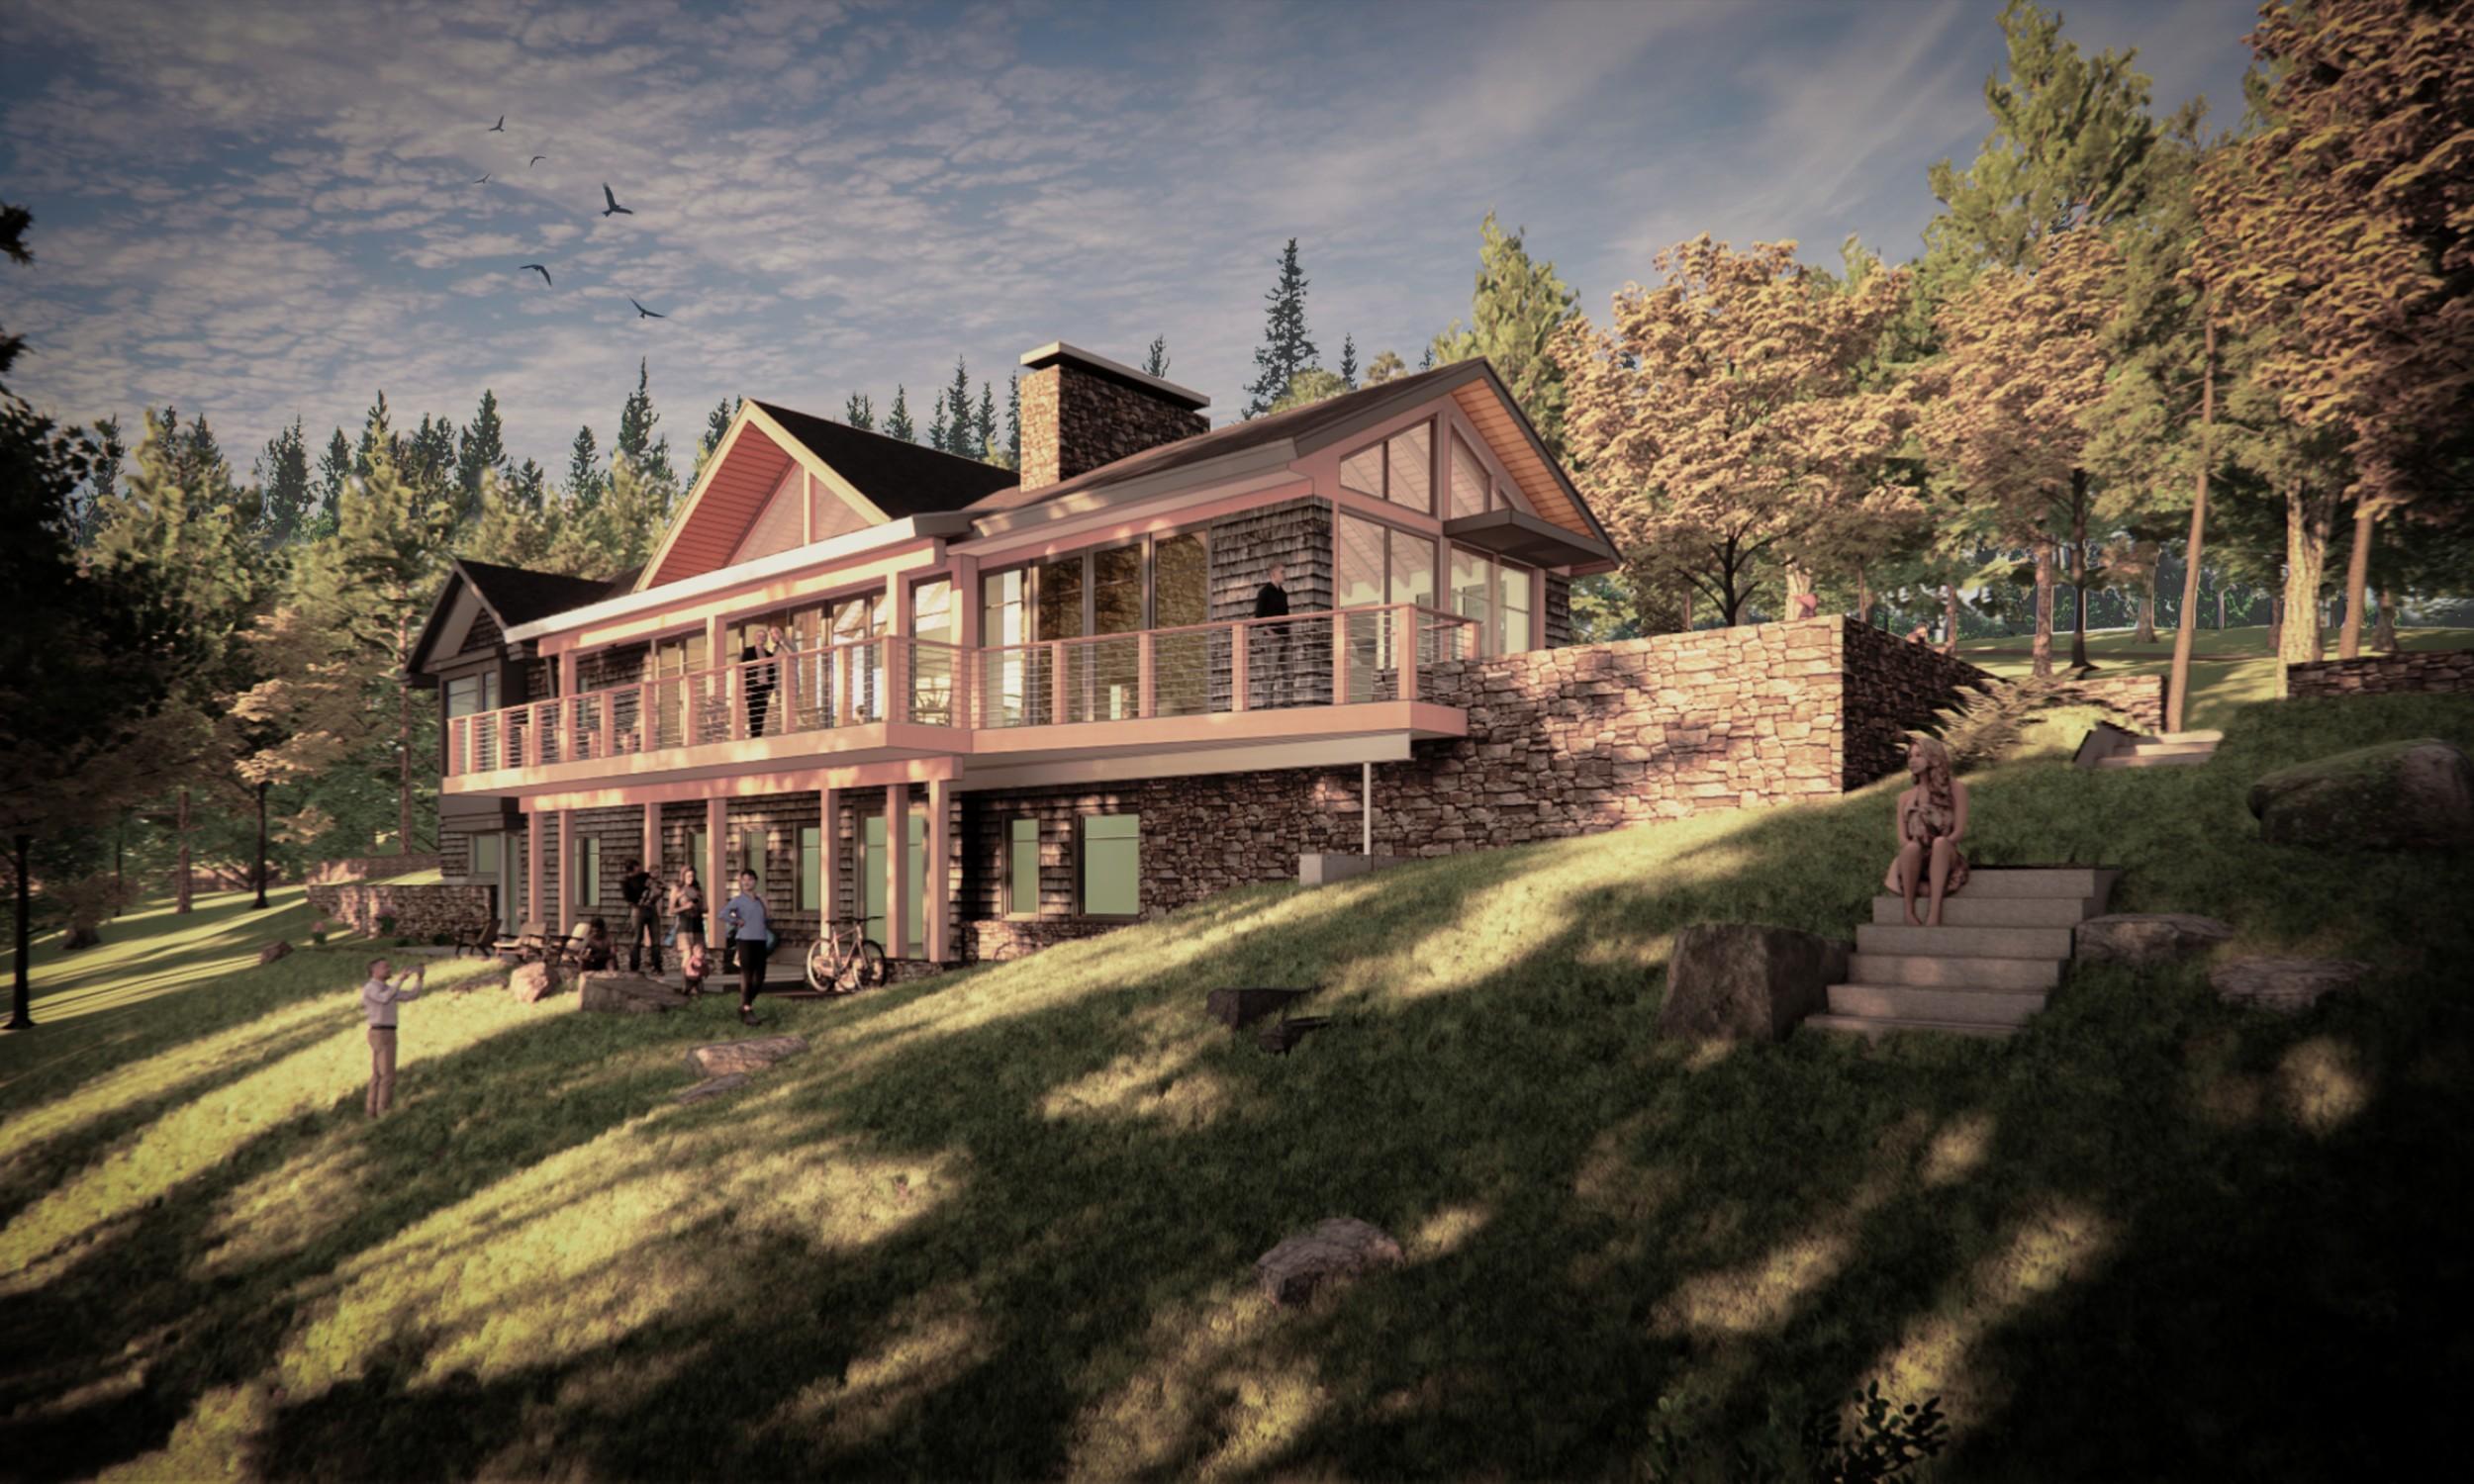 Waterfront home, Maine Architect, Lake living, Sliding Doors, cedar shingles